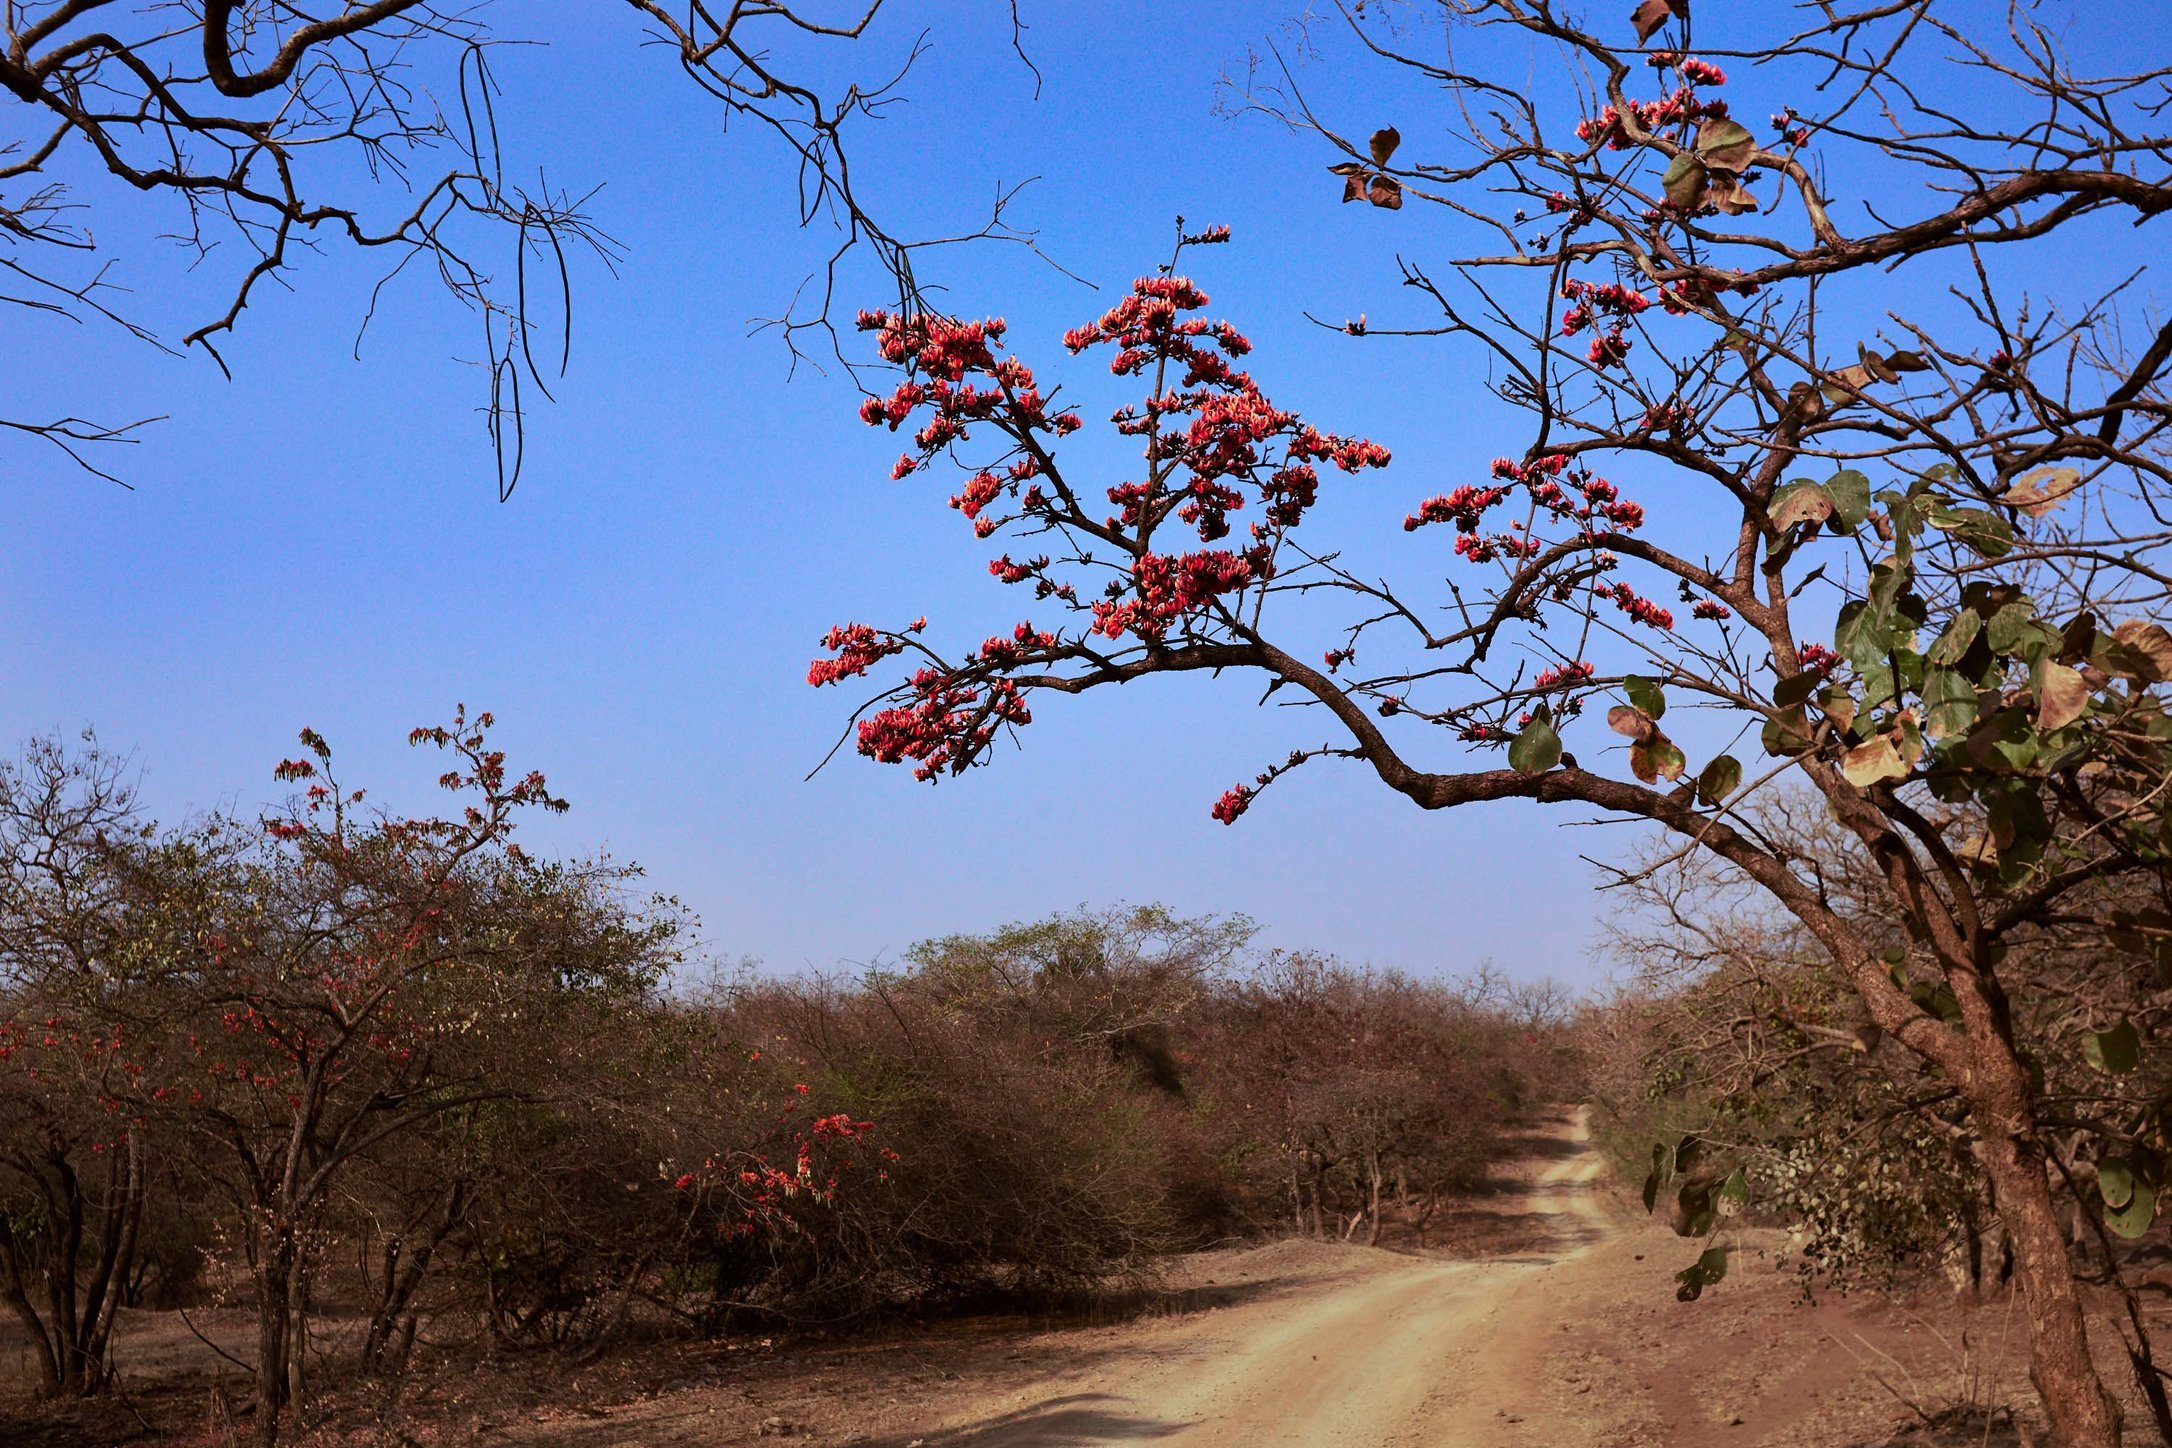 Pranidhi_Day5_Picture1.jpg